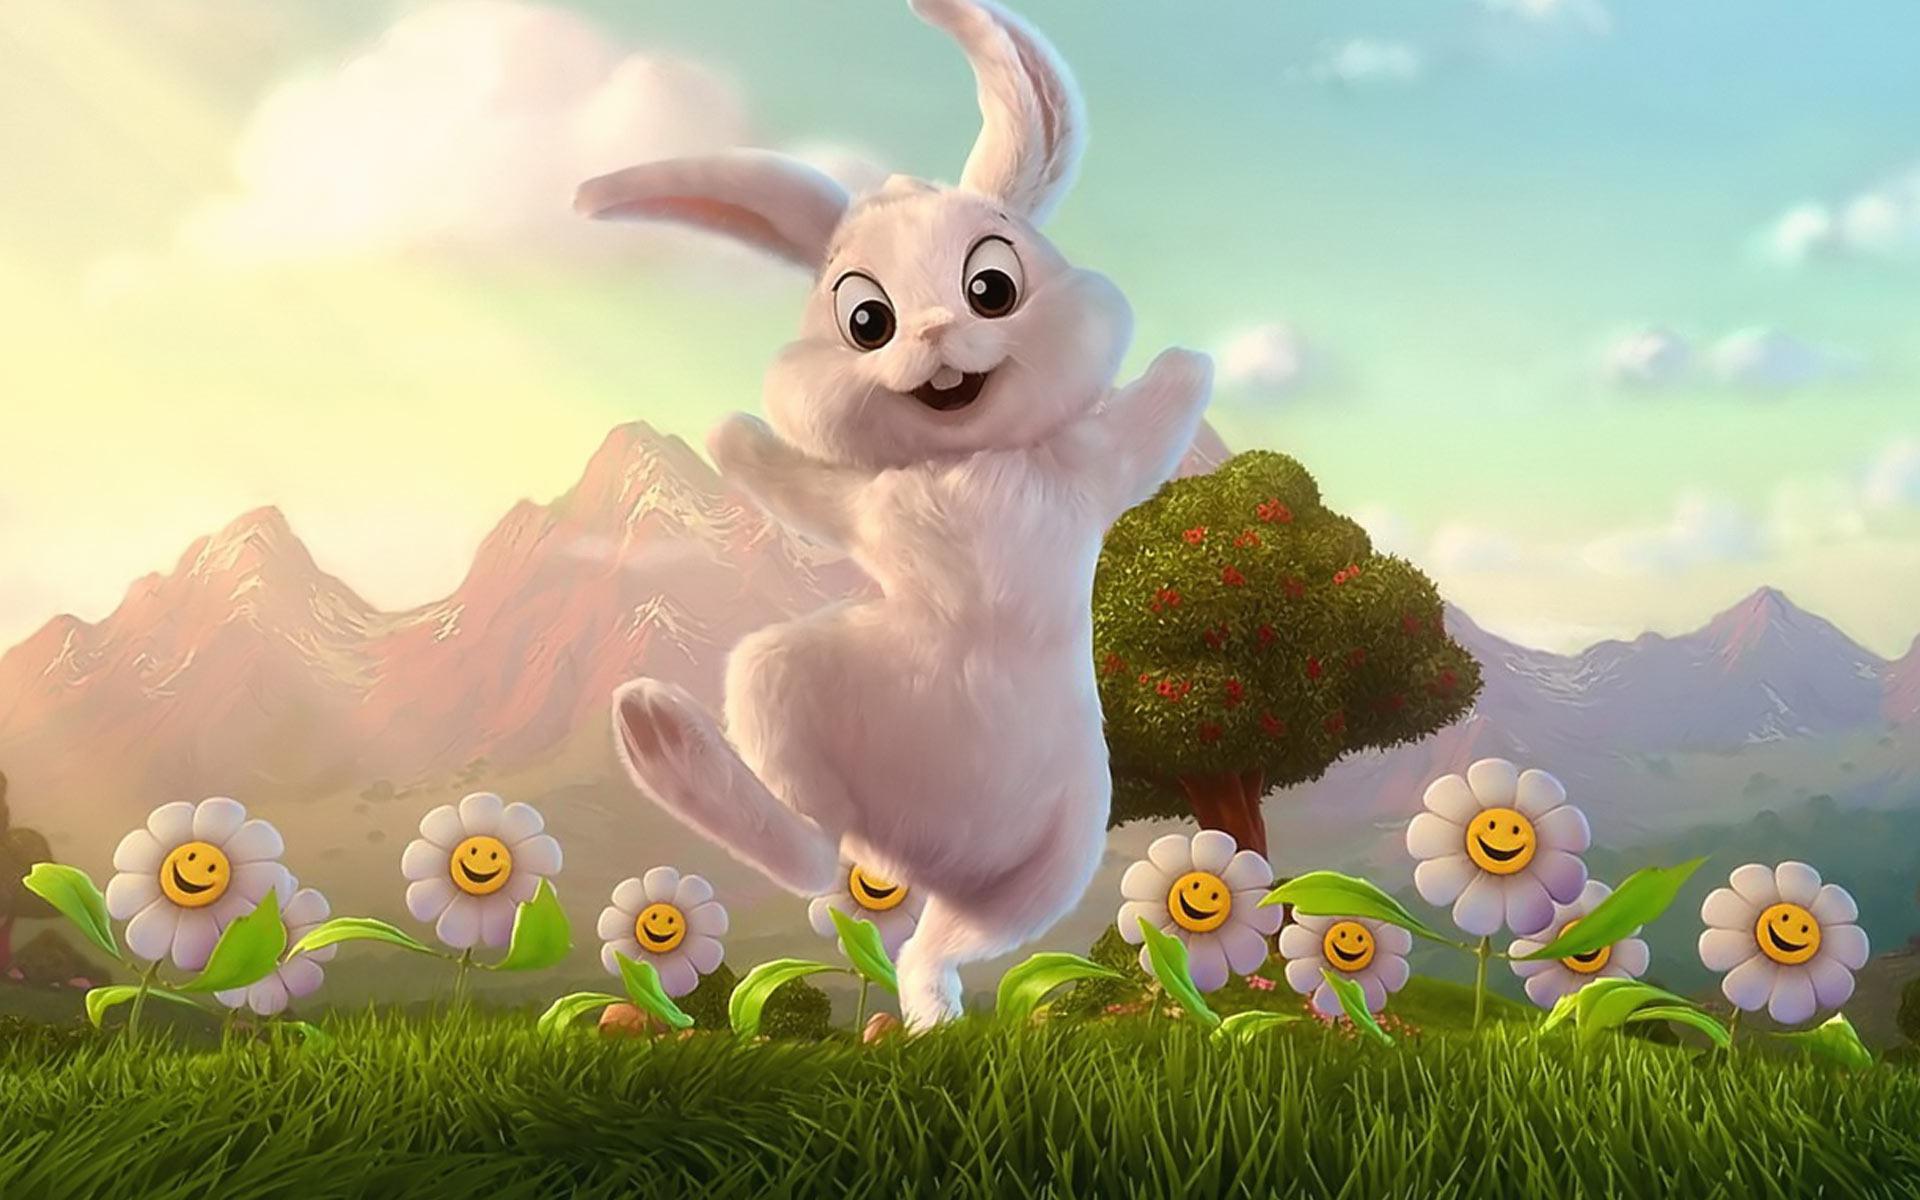 bunny 2016 easter 4k - photo #24